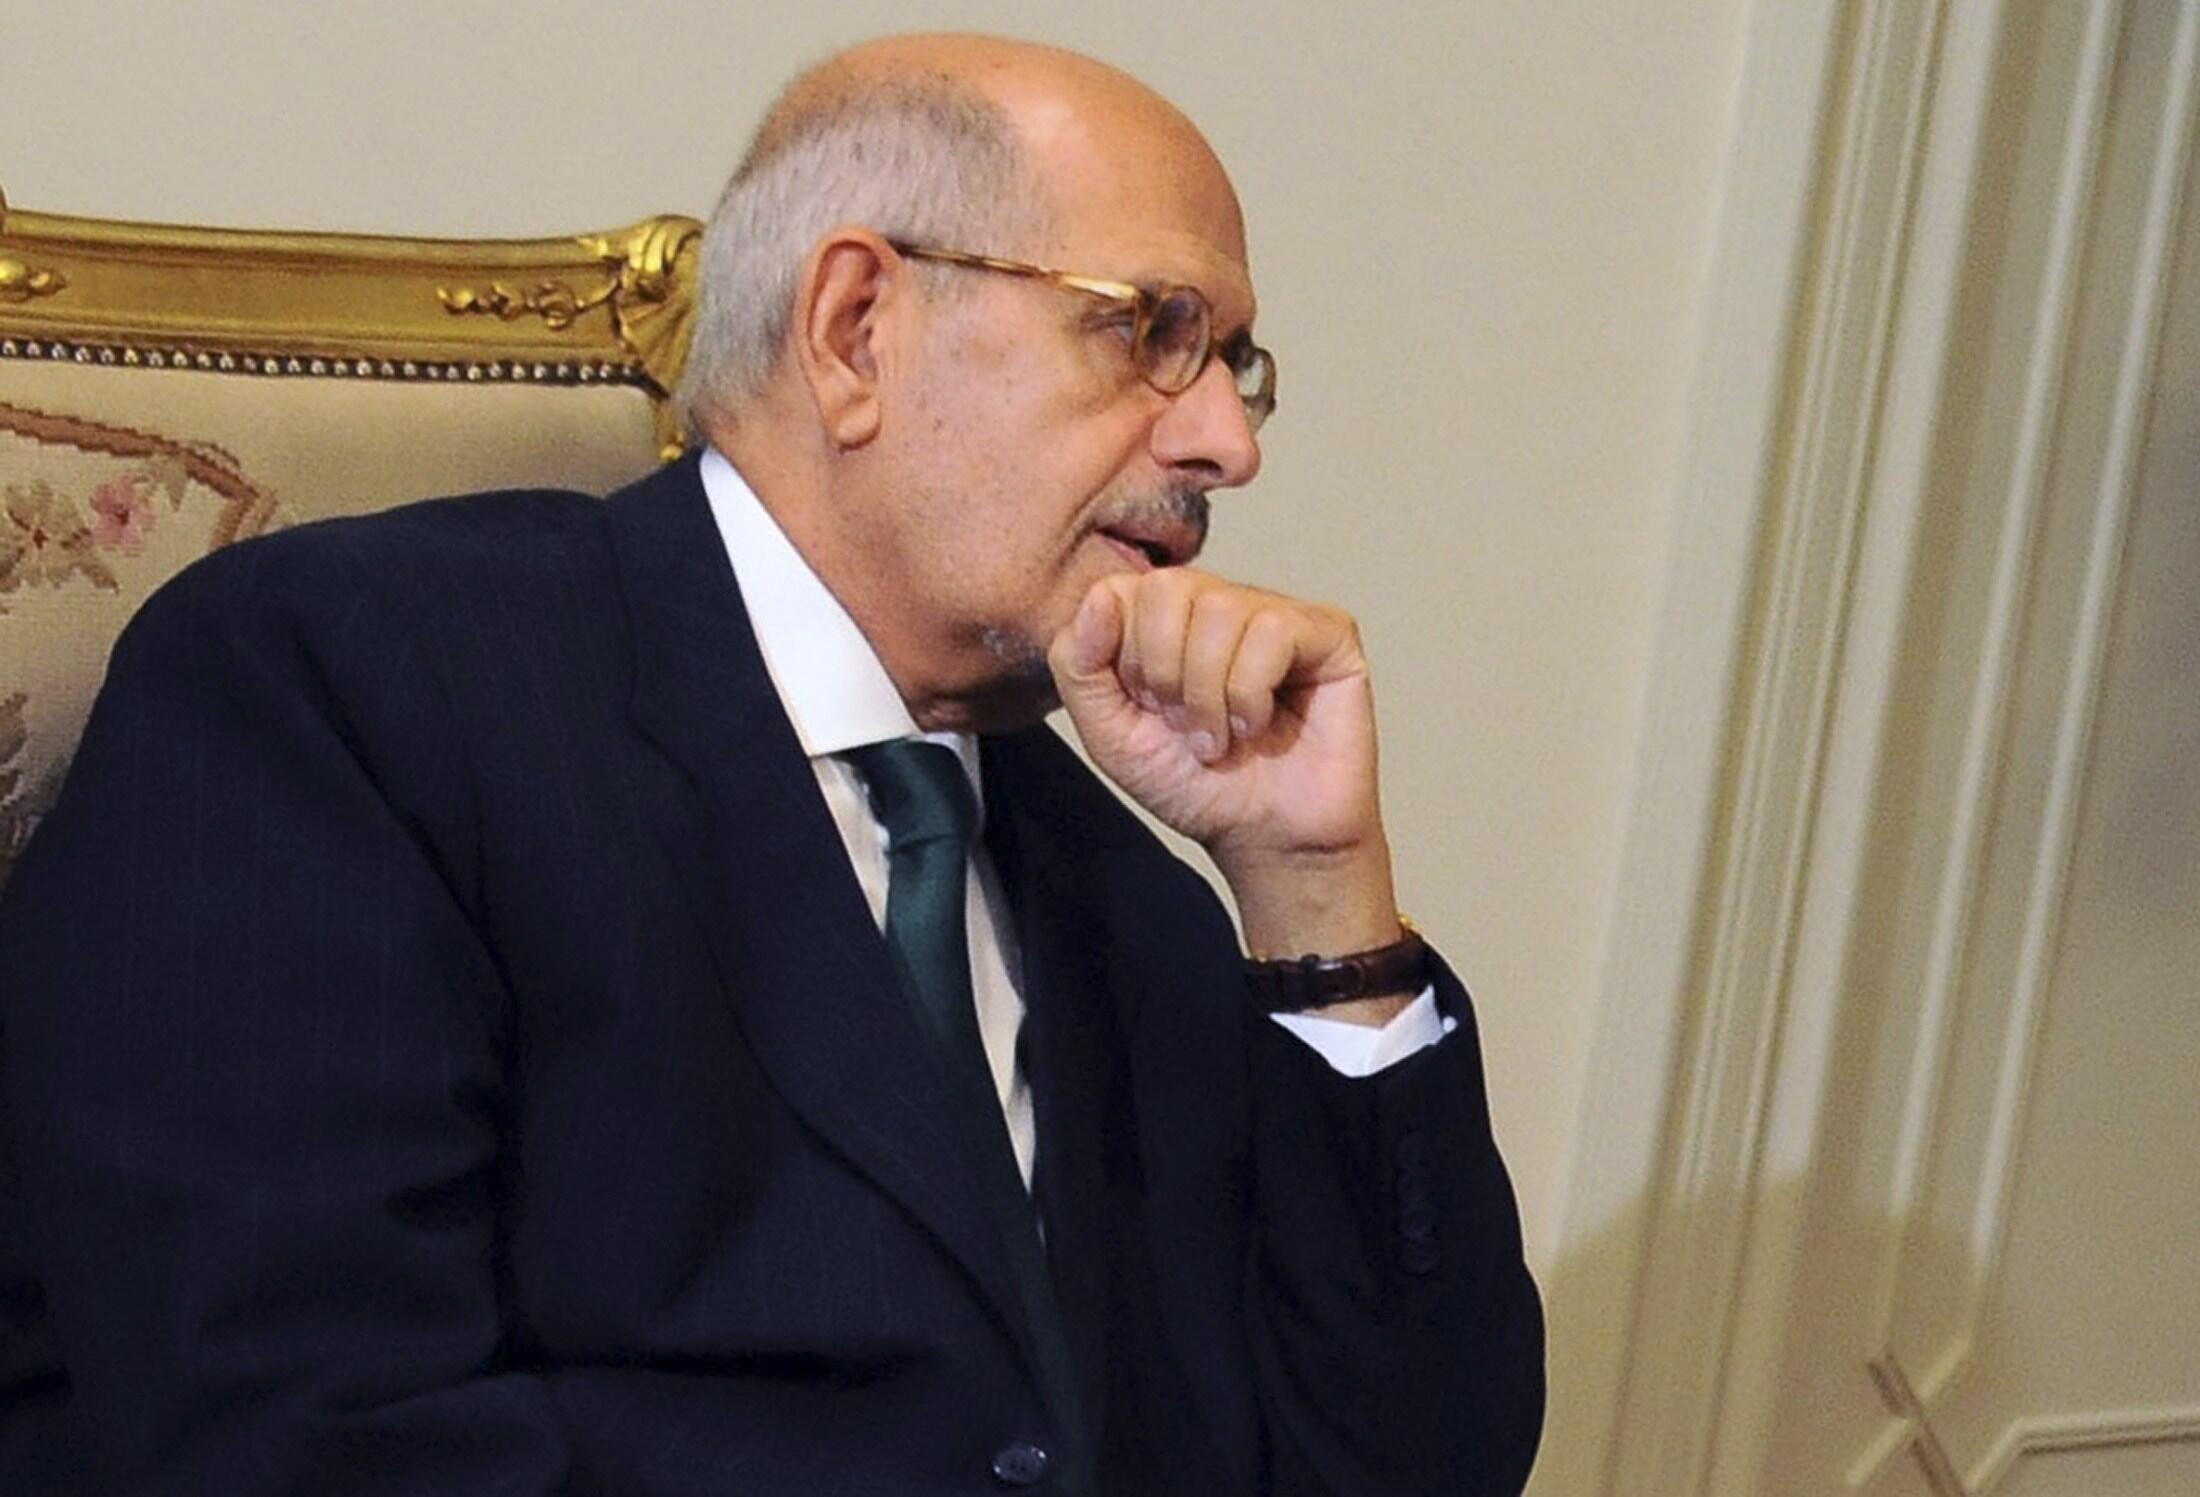 Временно исполняющий обязанности президента Египта Адли Мансур в президентском дворце 06/07/2013